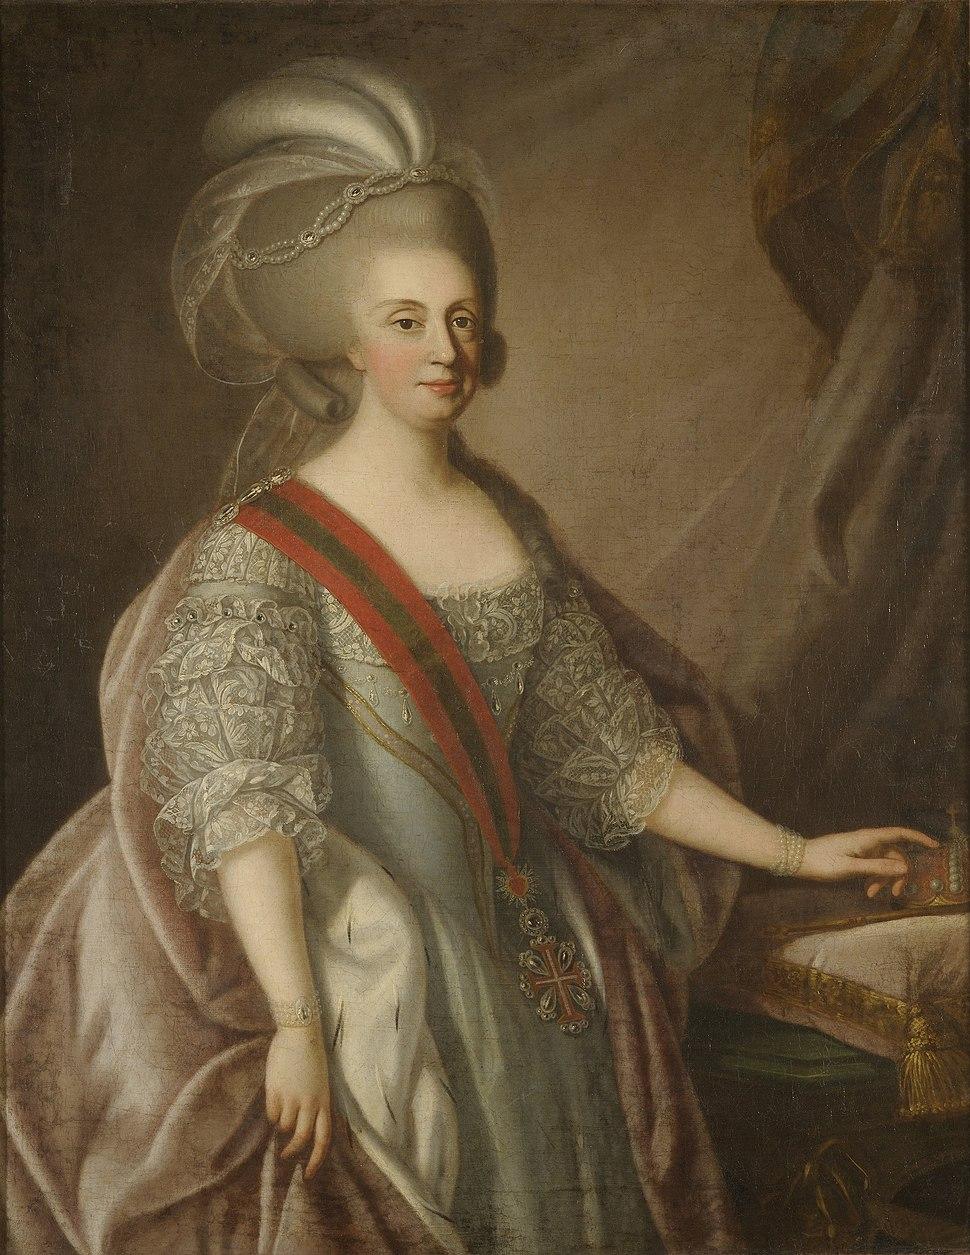 Maria I, Queen of Portugal - Giuseppe Troni, atribuído (Turim, 1739-Lisboa, 1810) - Google Cultural Institute